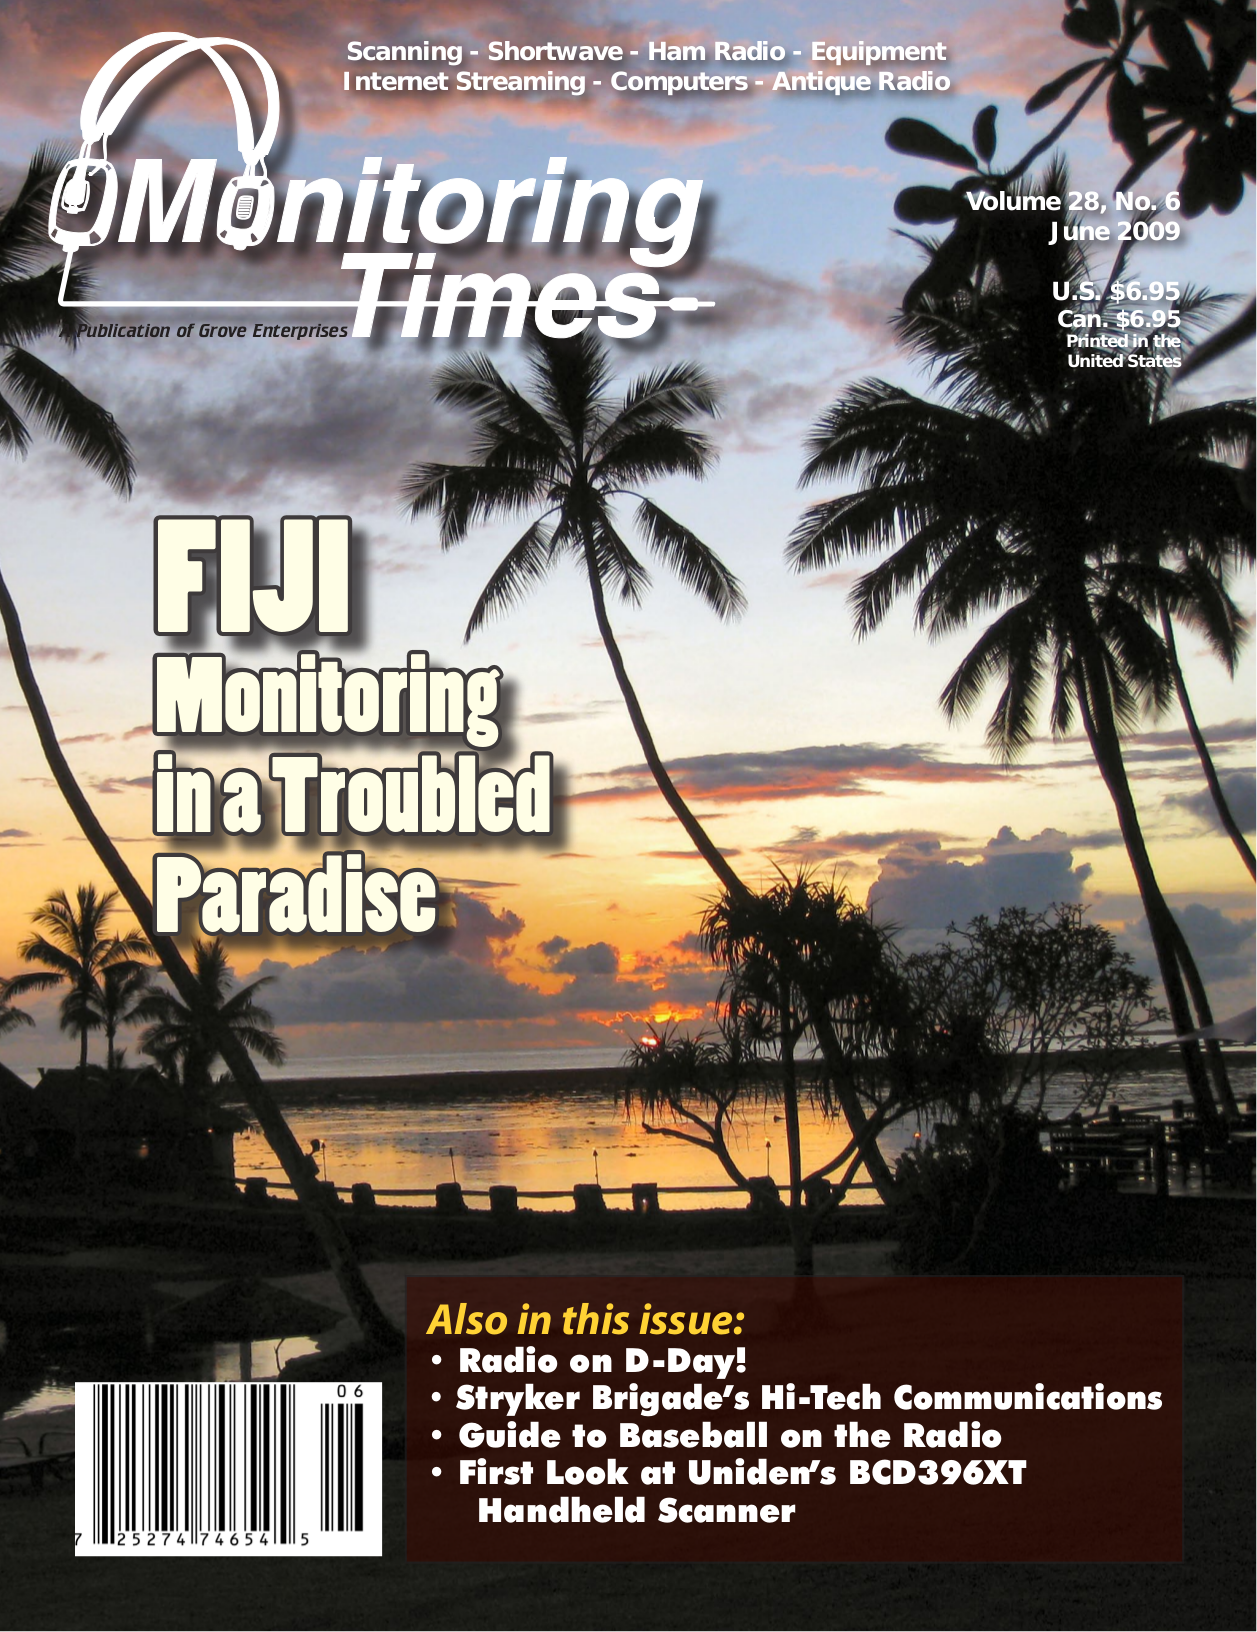 pdf for Rocketfish Headphone RF-9640 manual